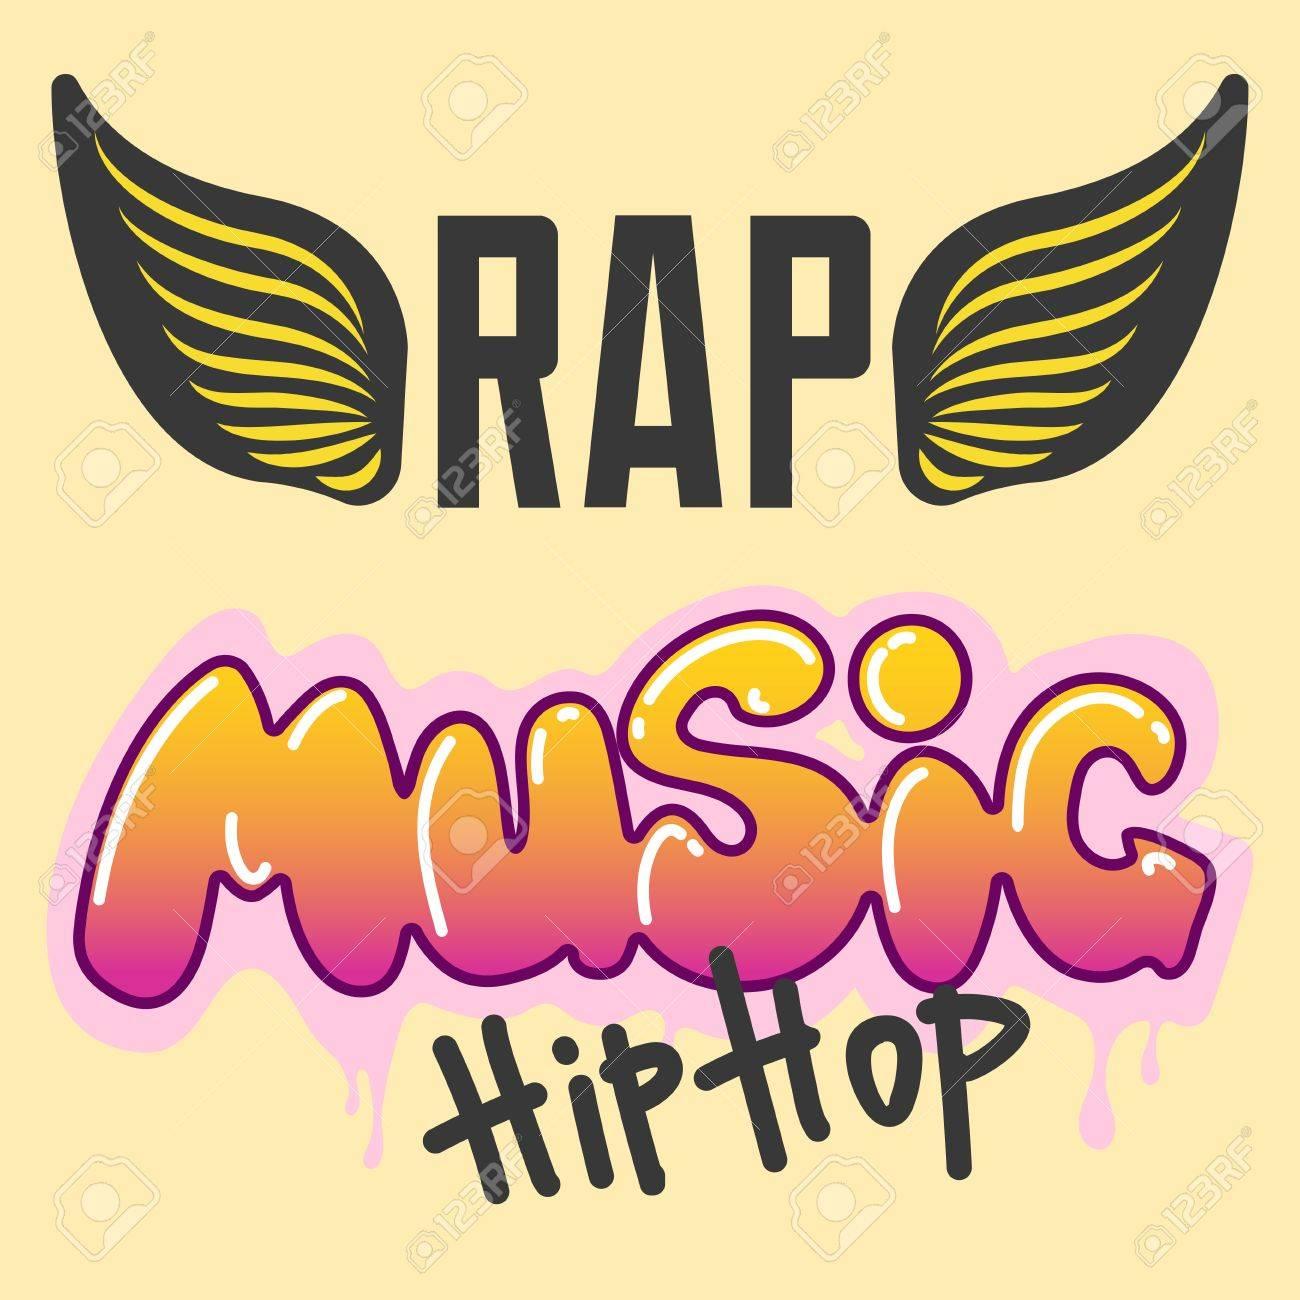 Graffiti Vector Hip Hop Music Text Art Urban Design Element Street Style Abstract Symbol Graphic